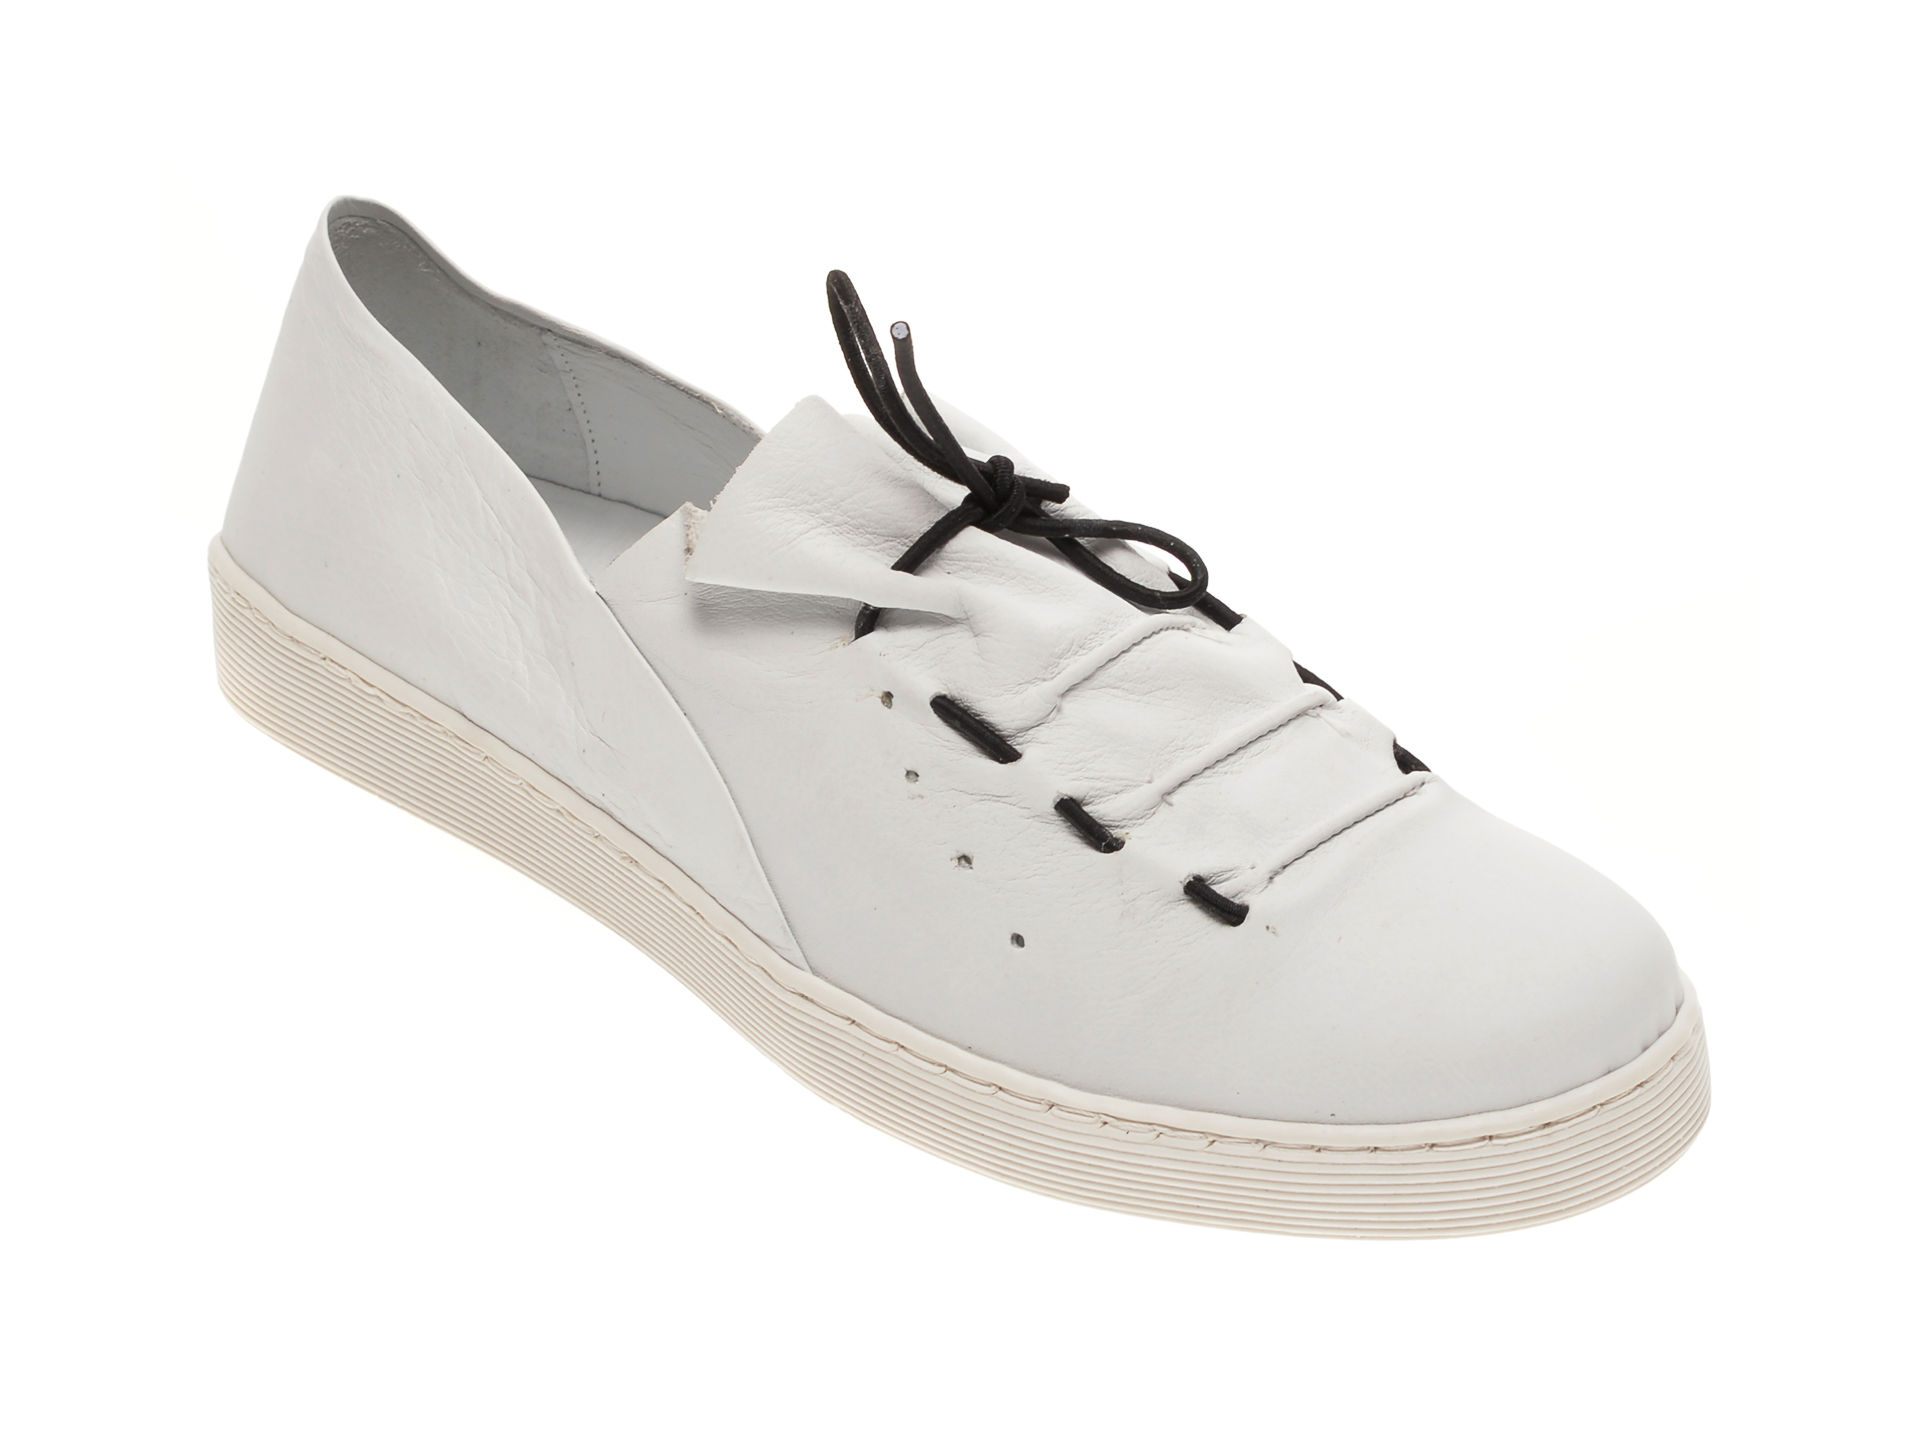 Pantofi BABOOS albi, R09, din piele naturala